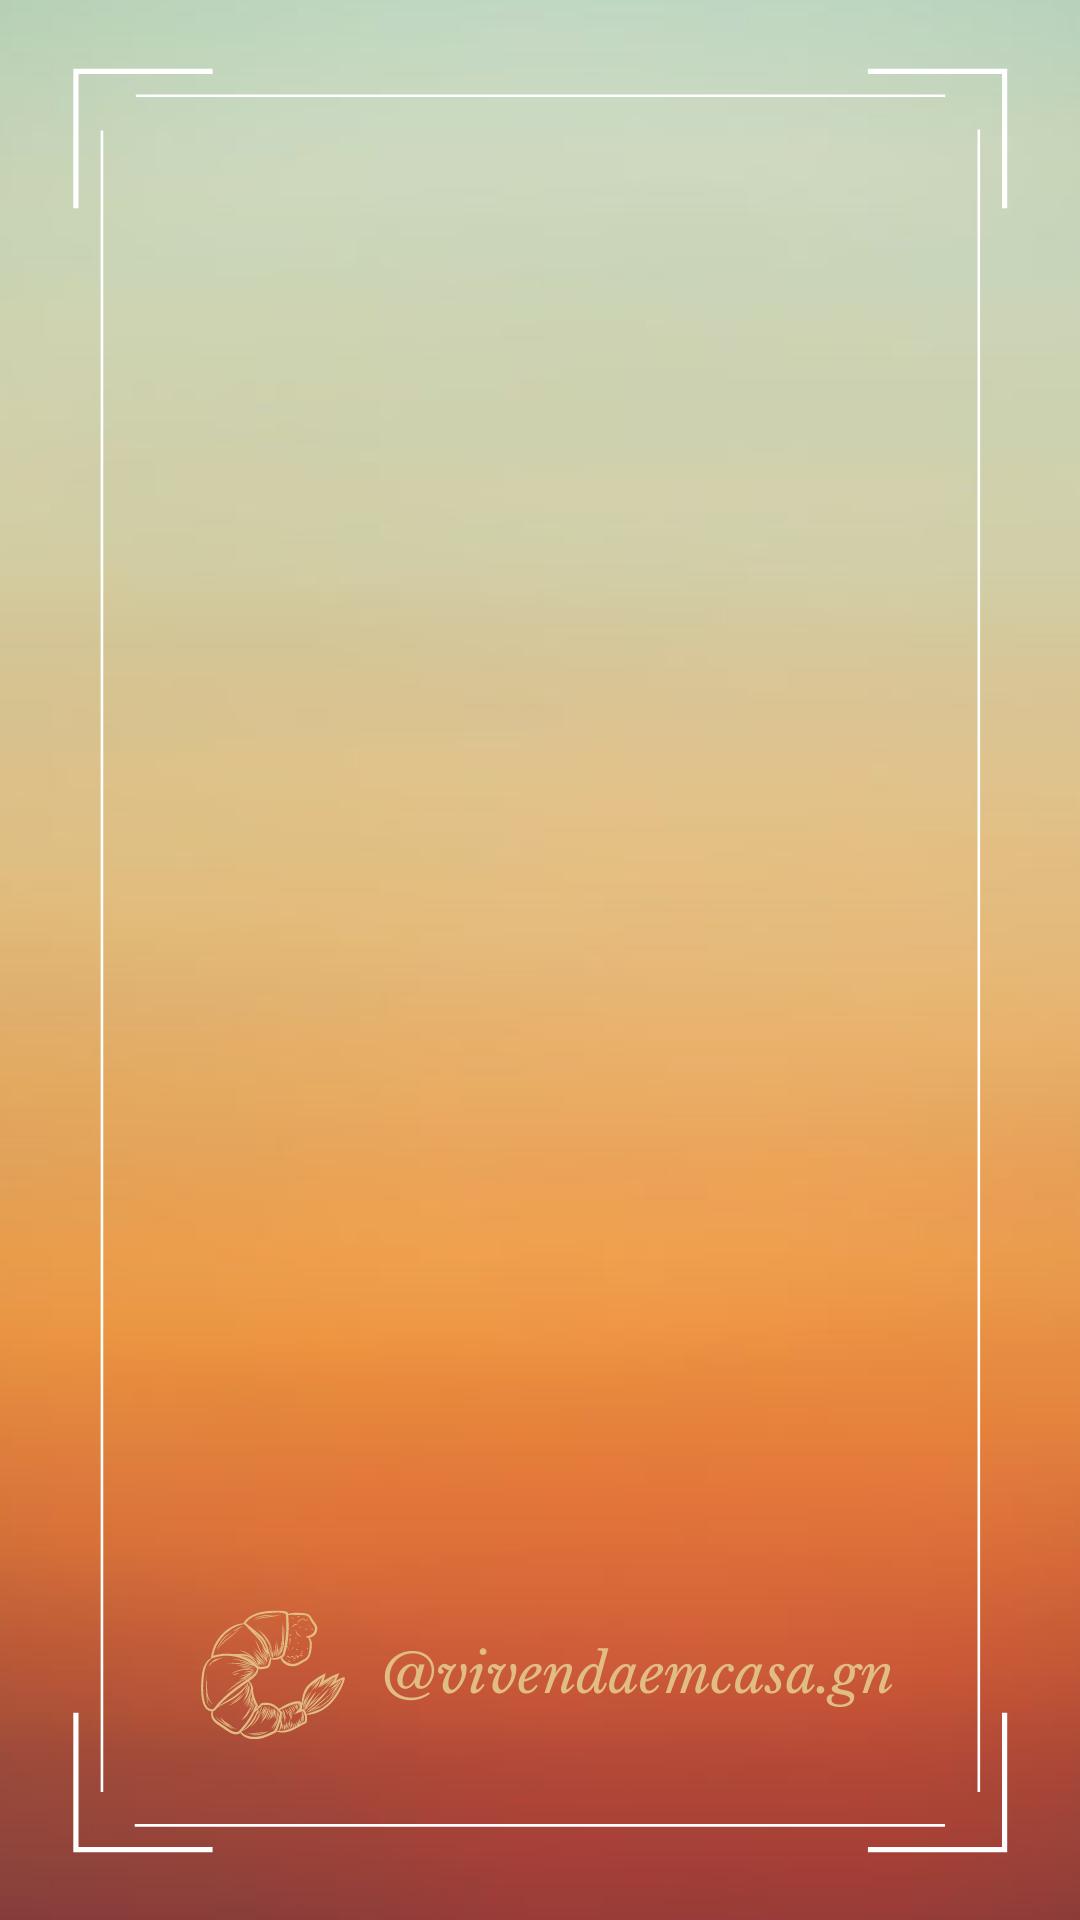 vivendaemcasagn Background